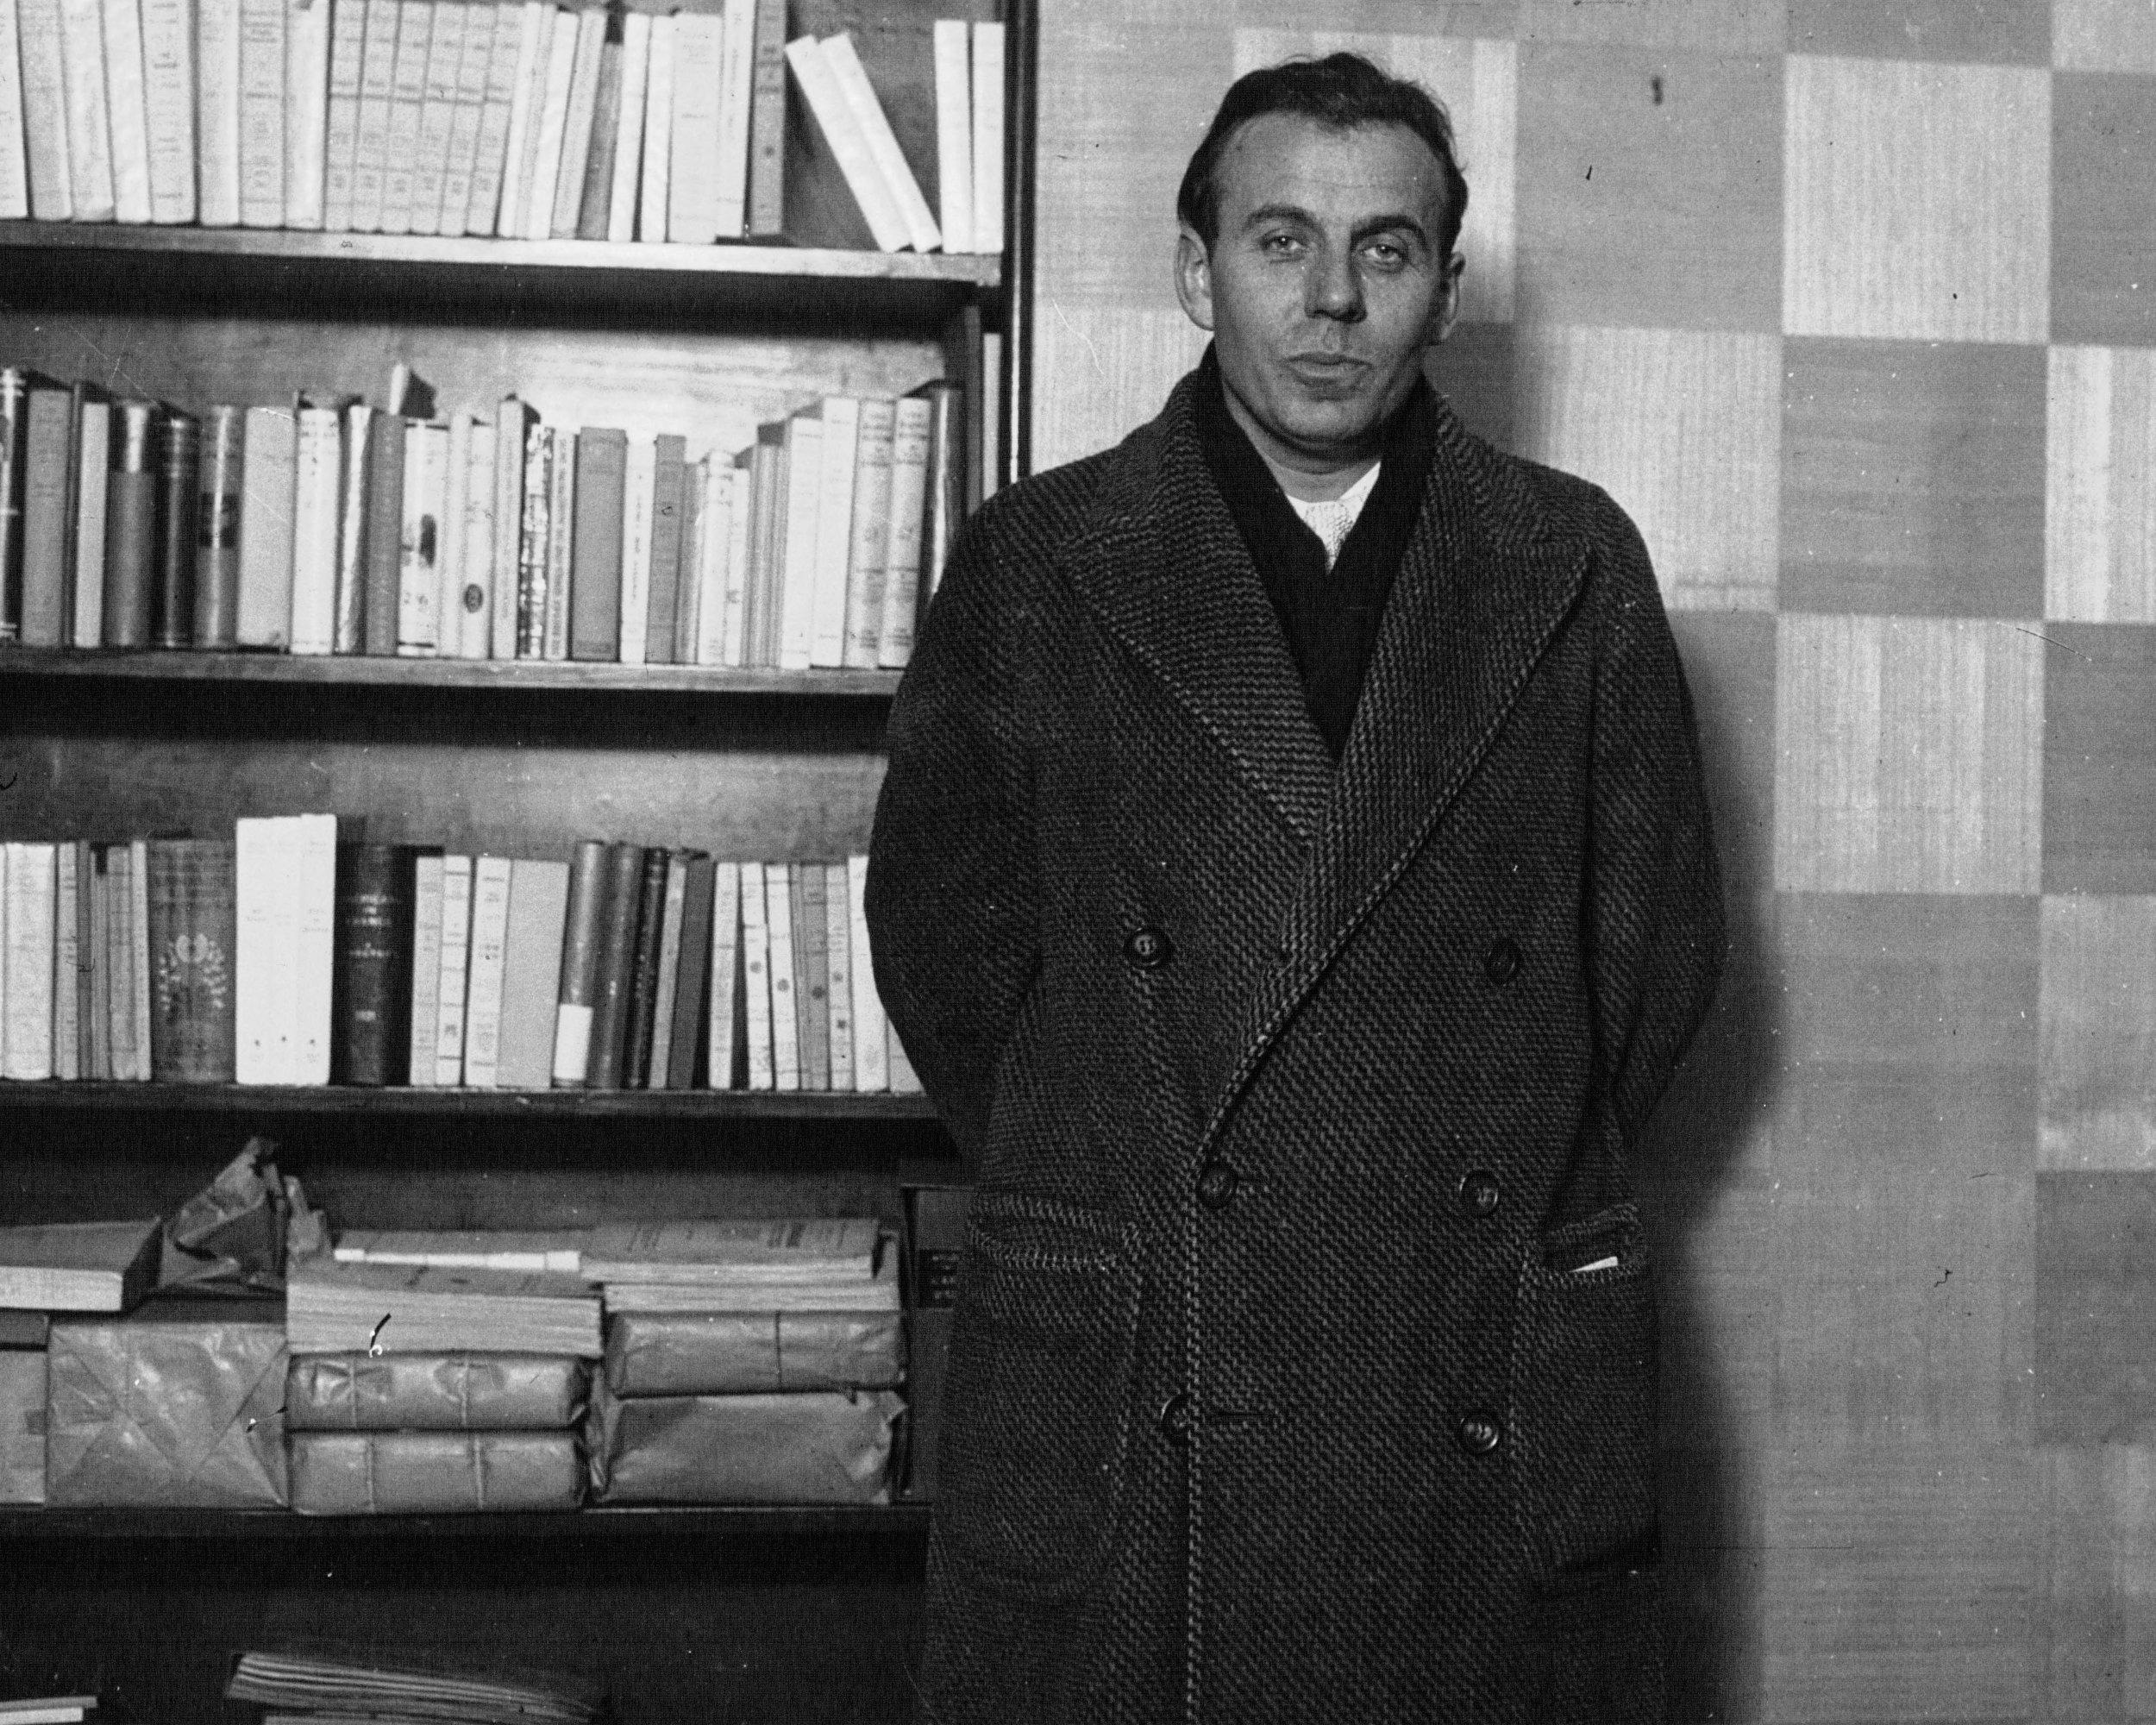 L'anarcofascismo tanto caro ai francesi e non solo… (quinta parte)